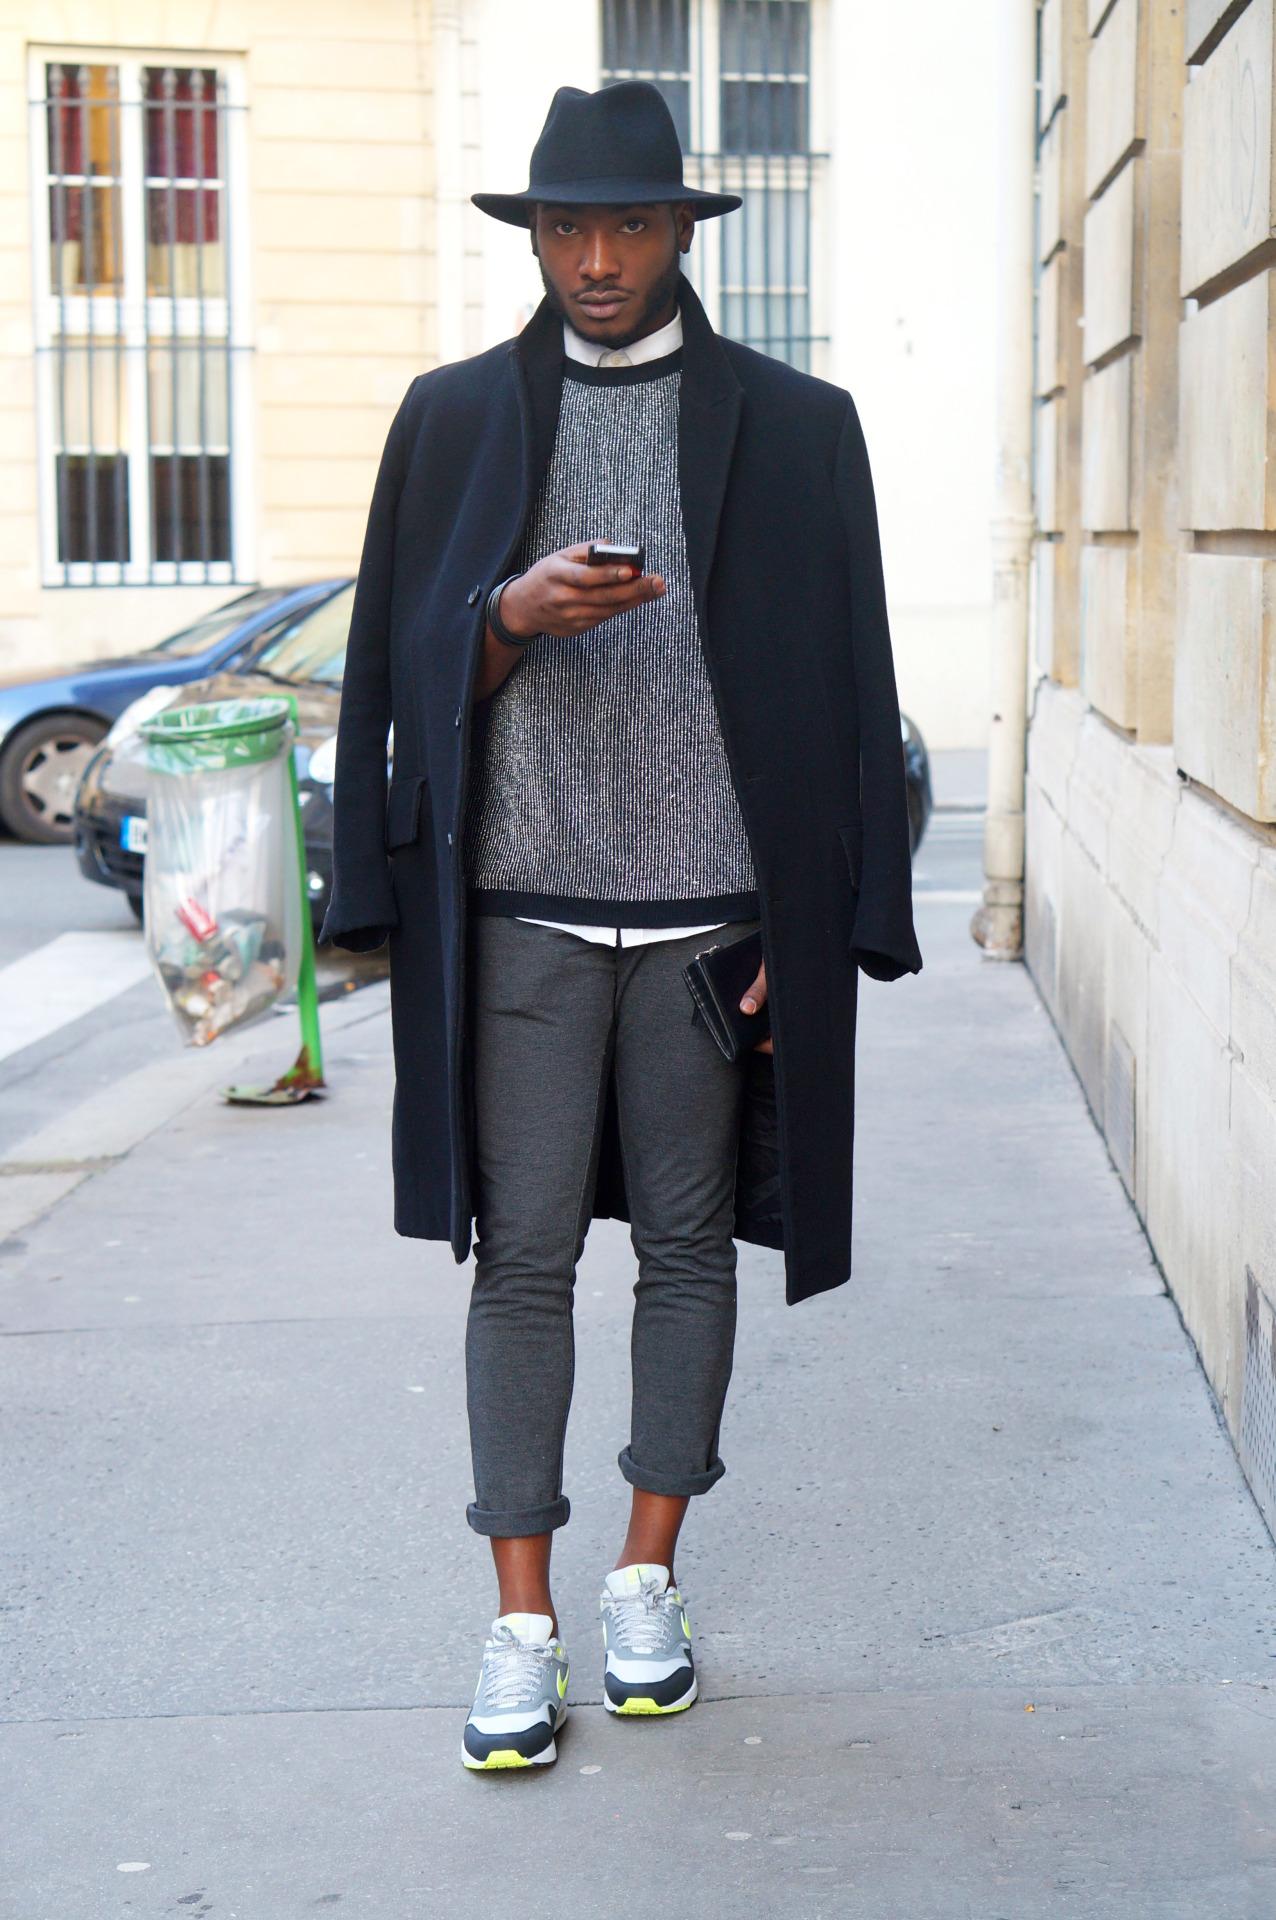 blackfashion :     Harvey, 22, Paris,    http://www.harveymm.com    instagram: Harvey_mm